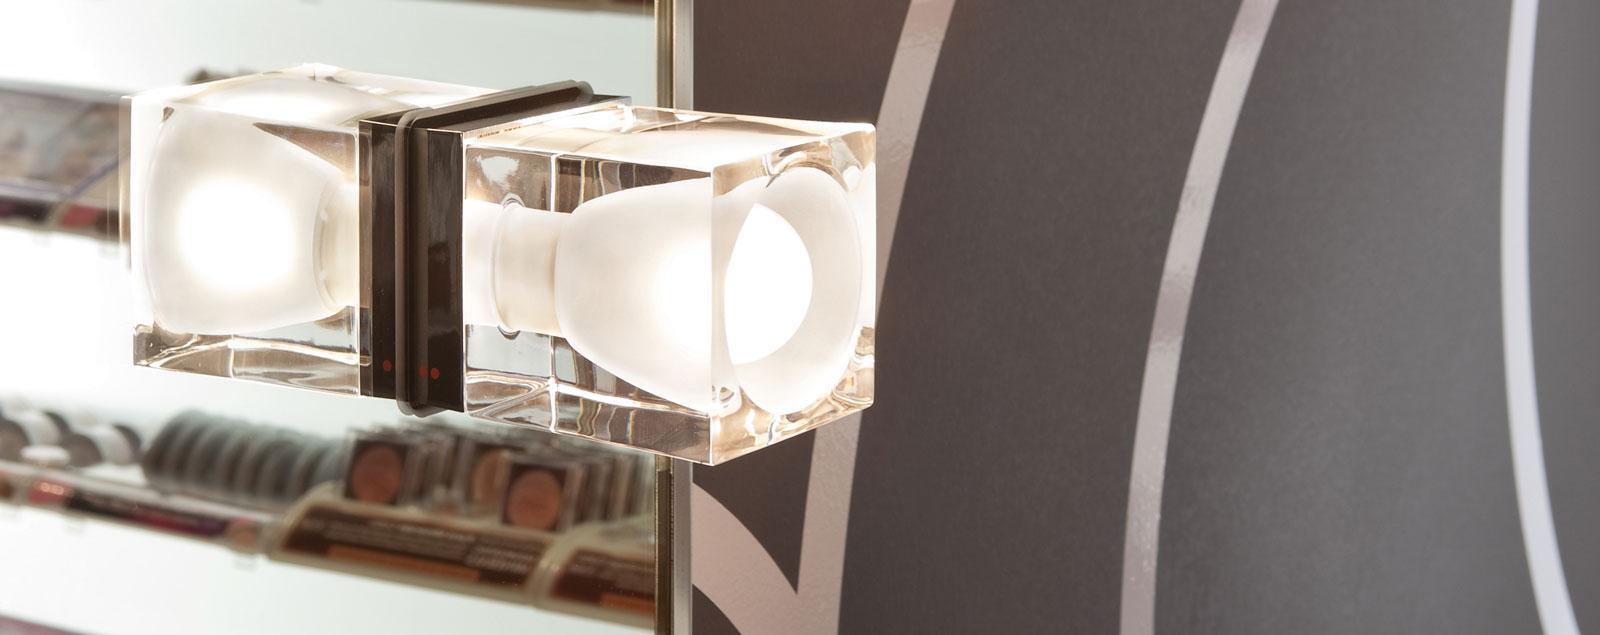 D28 Cubetto wall and ceiling - Fabbian Illuminazione